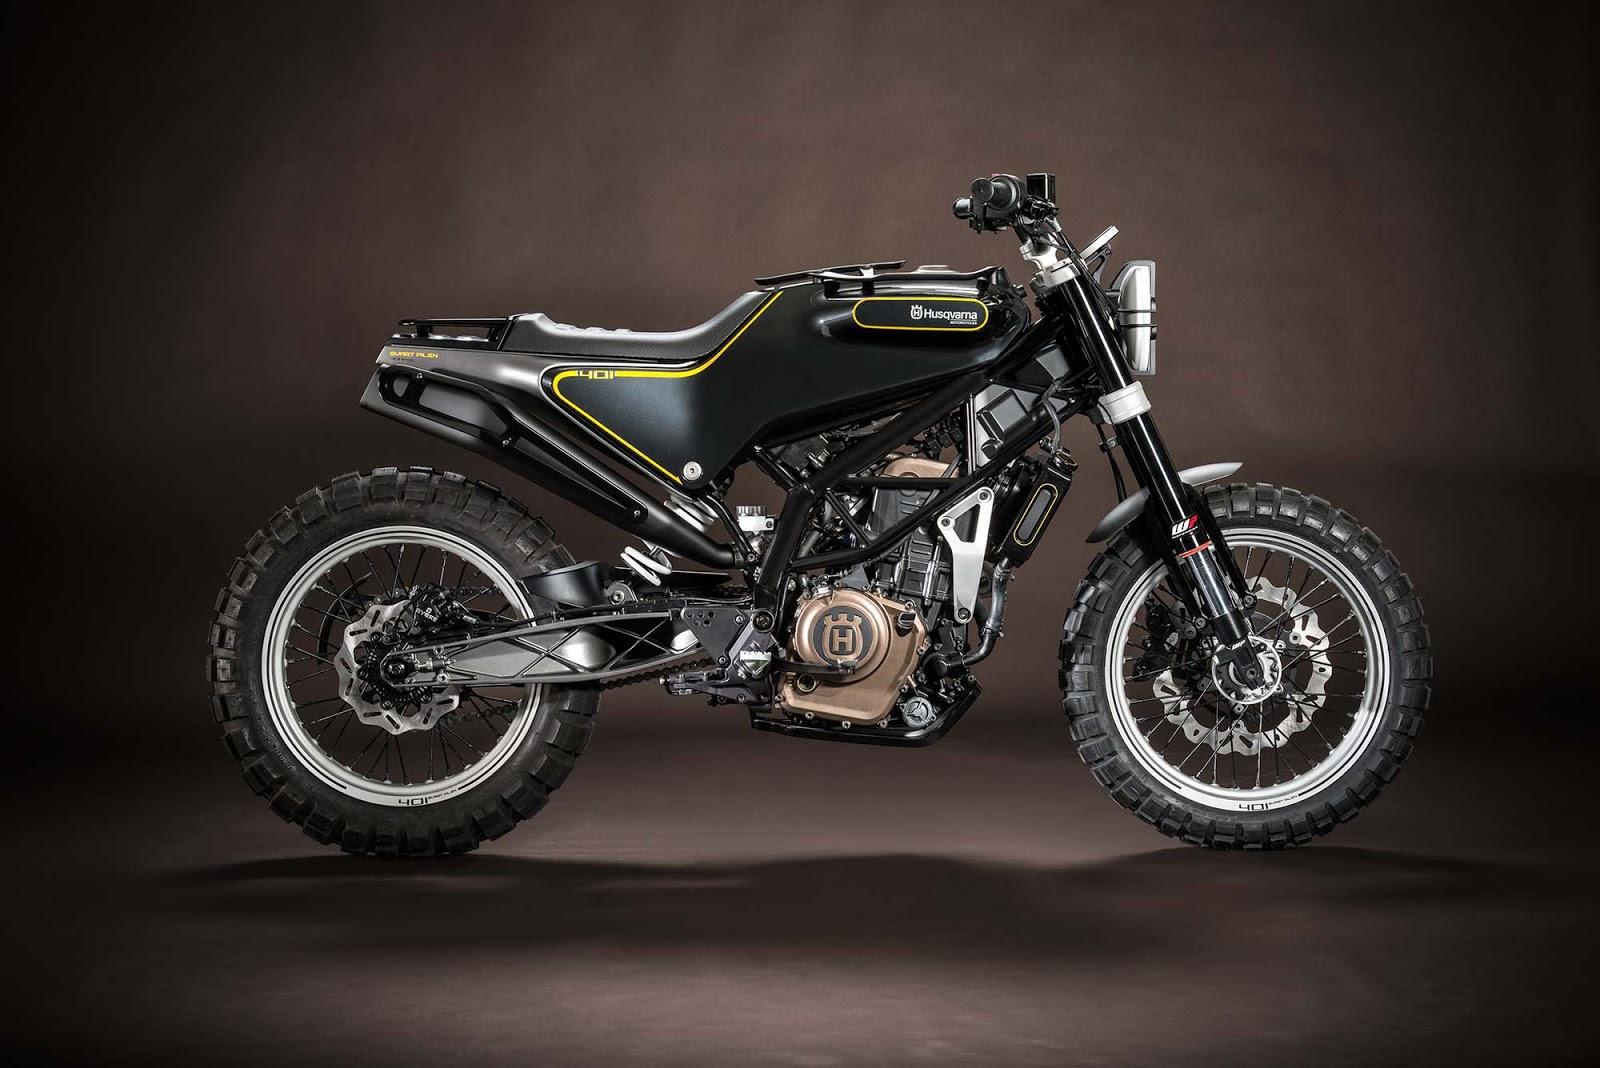 Honda Grom Price >> Husqvarna Introducing New Bike 401 Svartpilen In India 2017 | Bike Car Art Photos Images ...